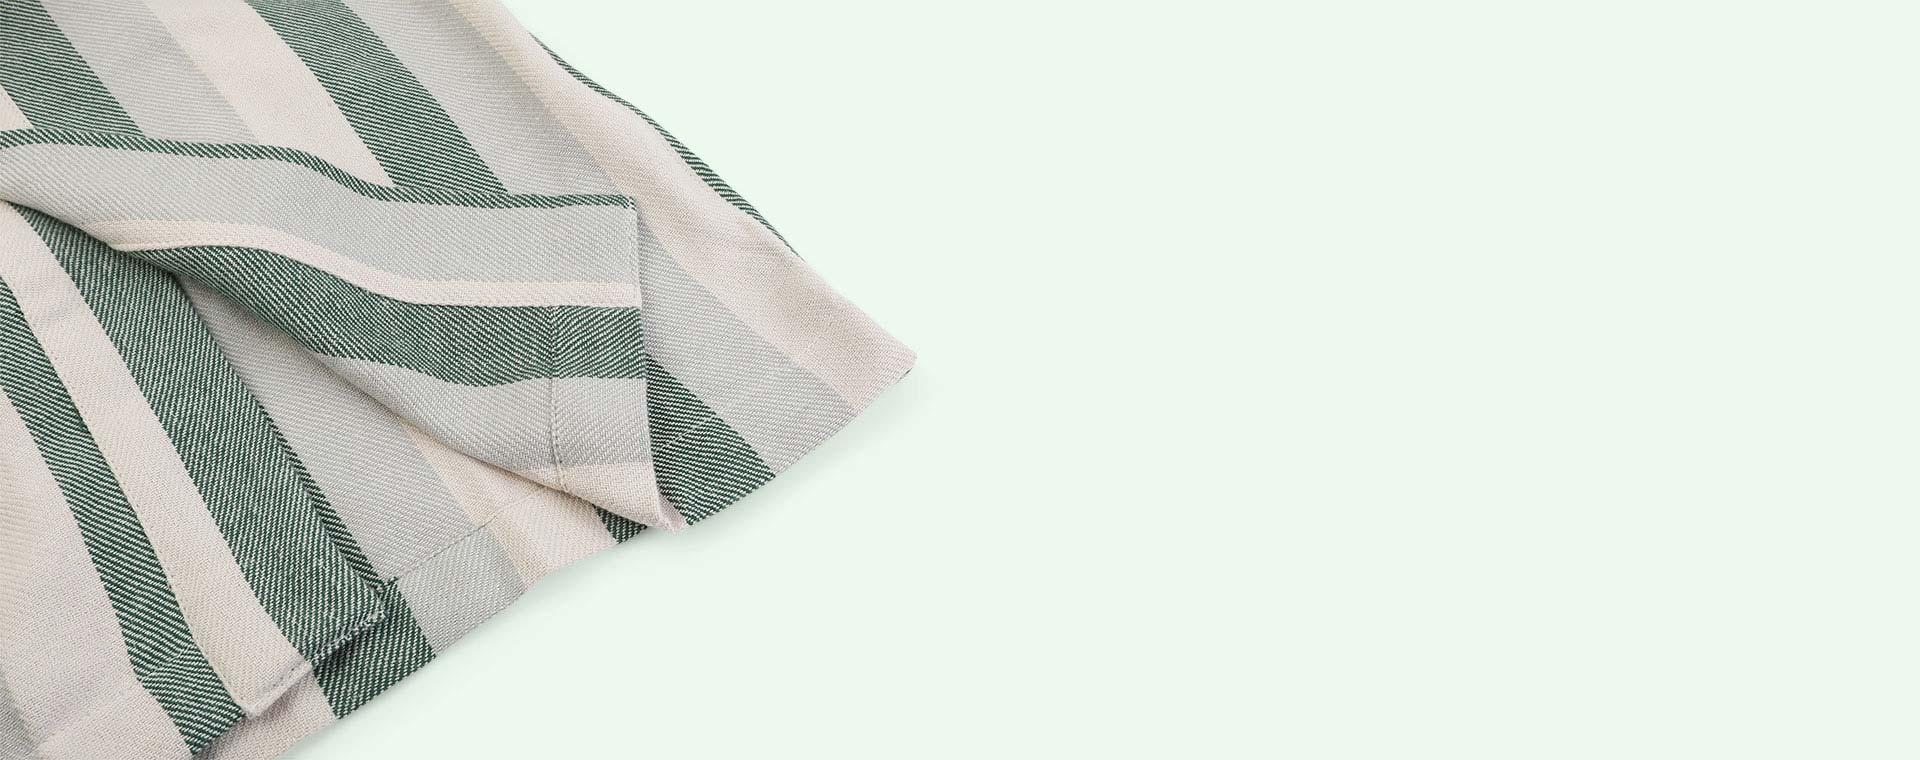 Garden green/sandy/dove blue Liewood Dana bathrobe